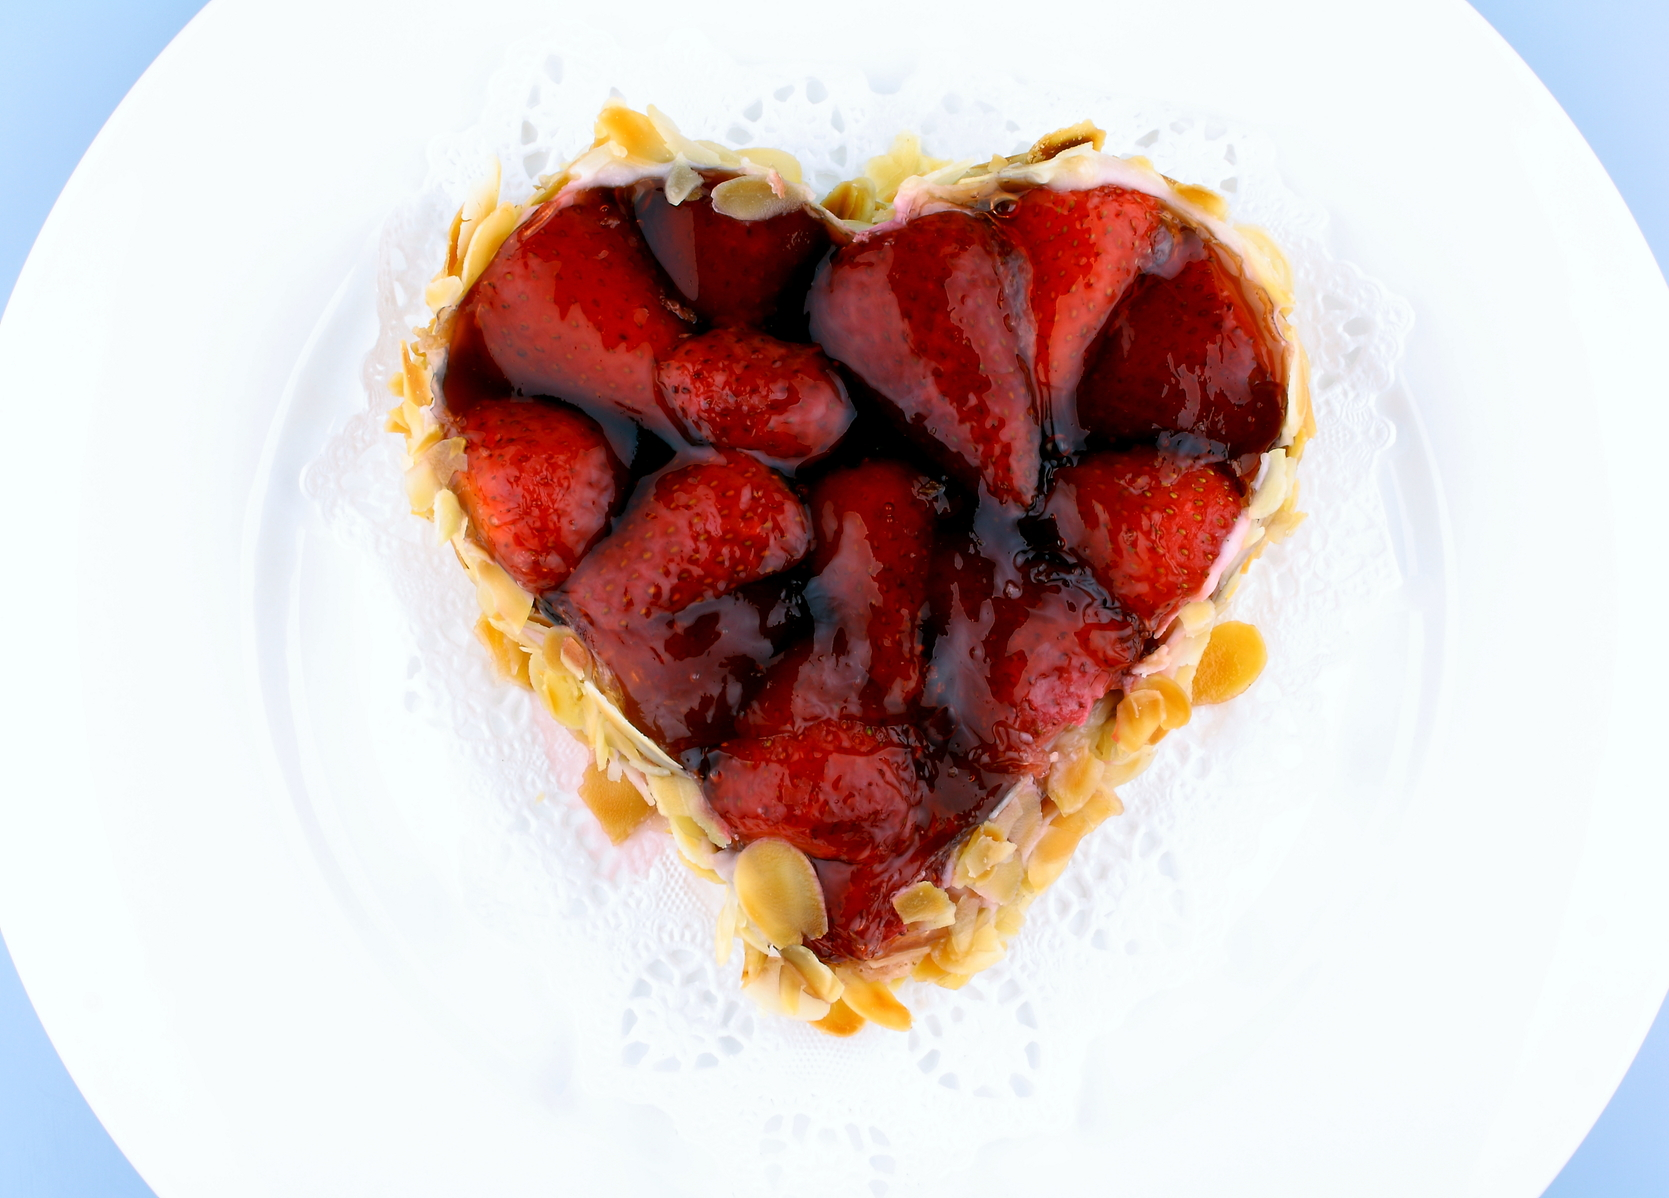 Corazón de hojaldre con fresas